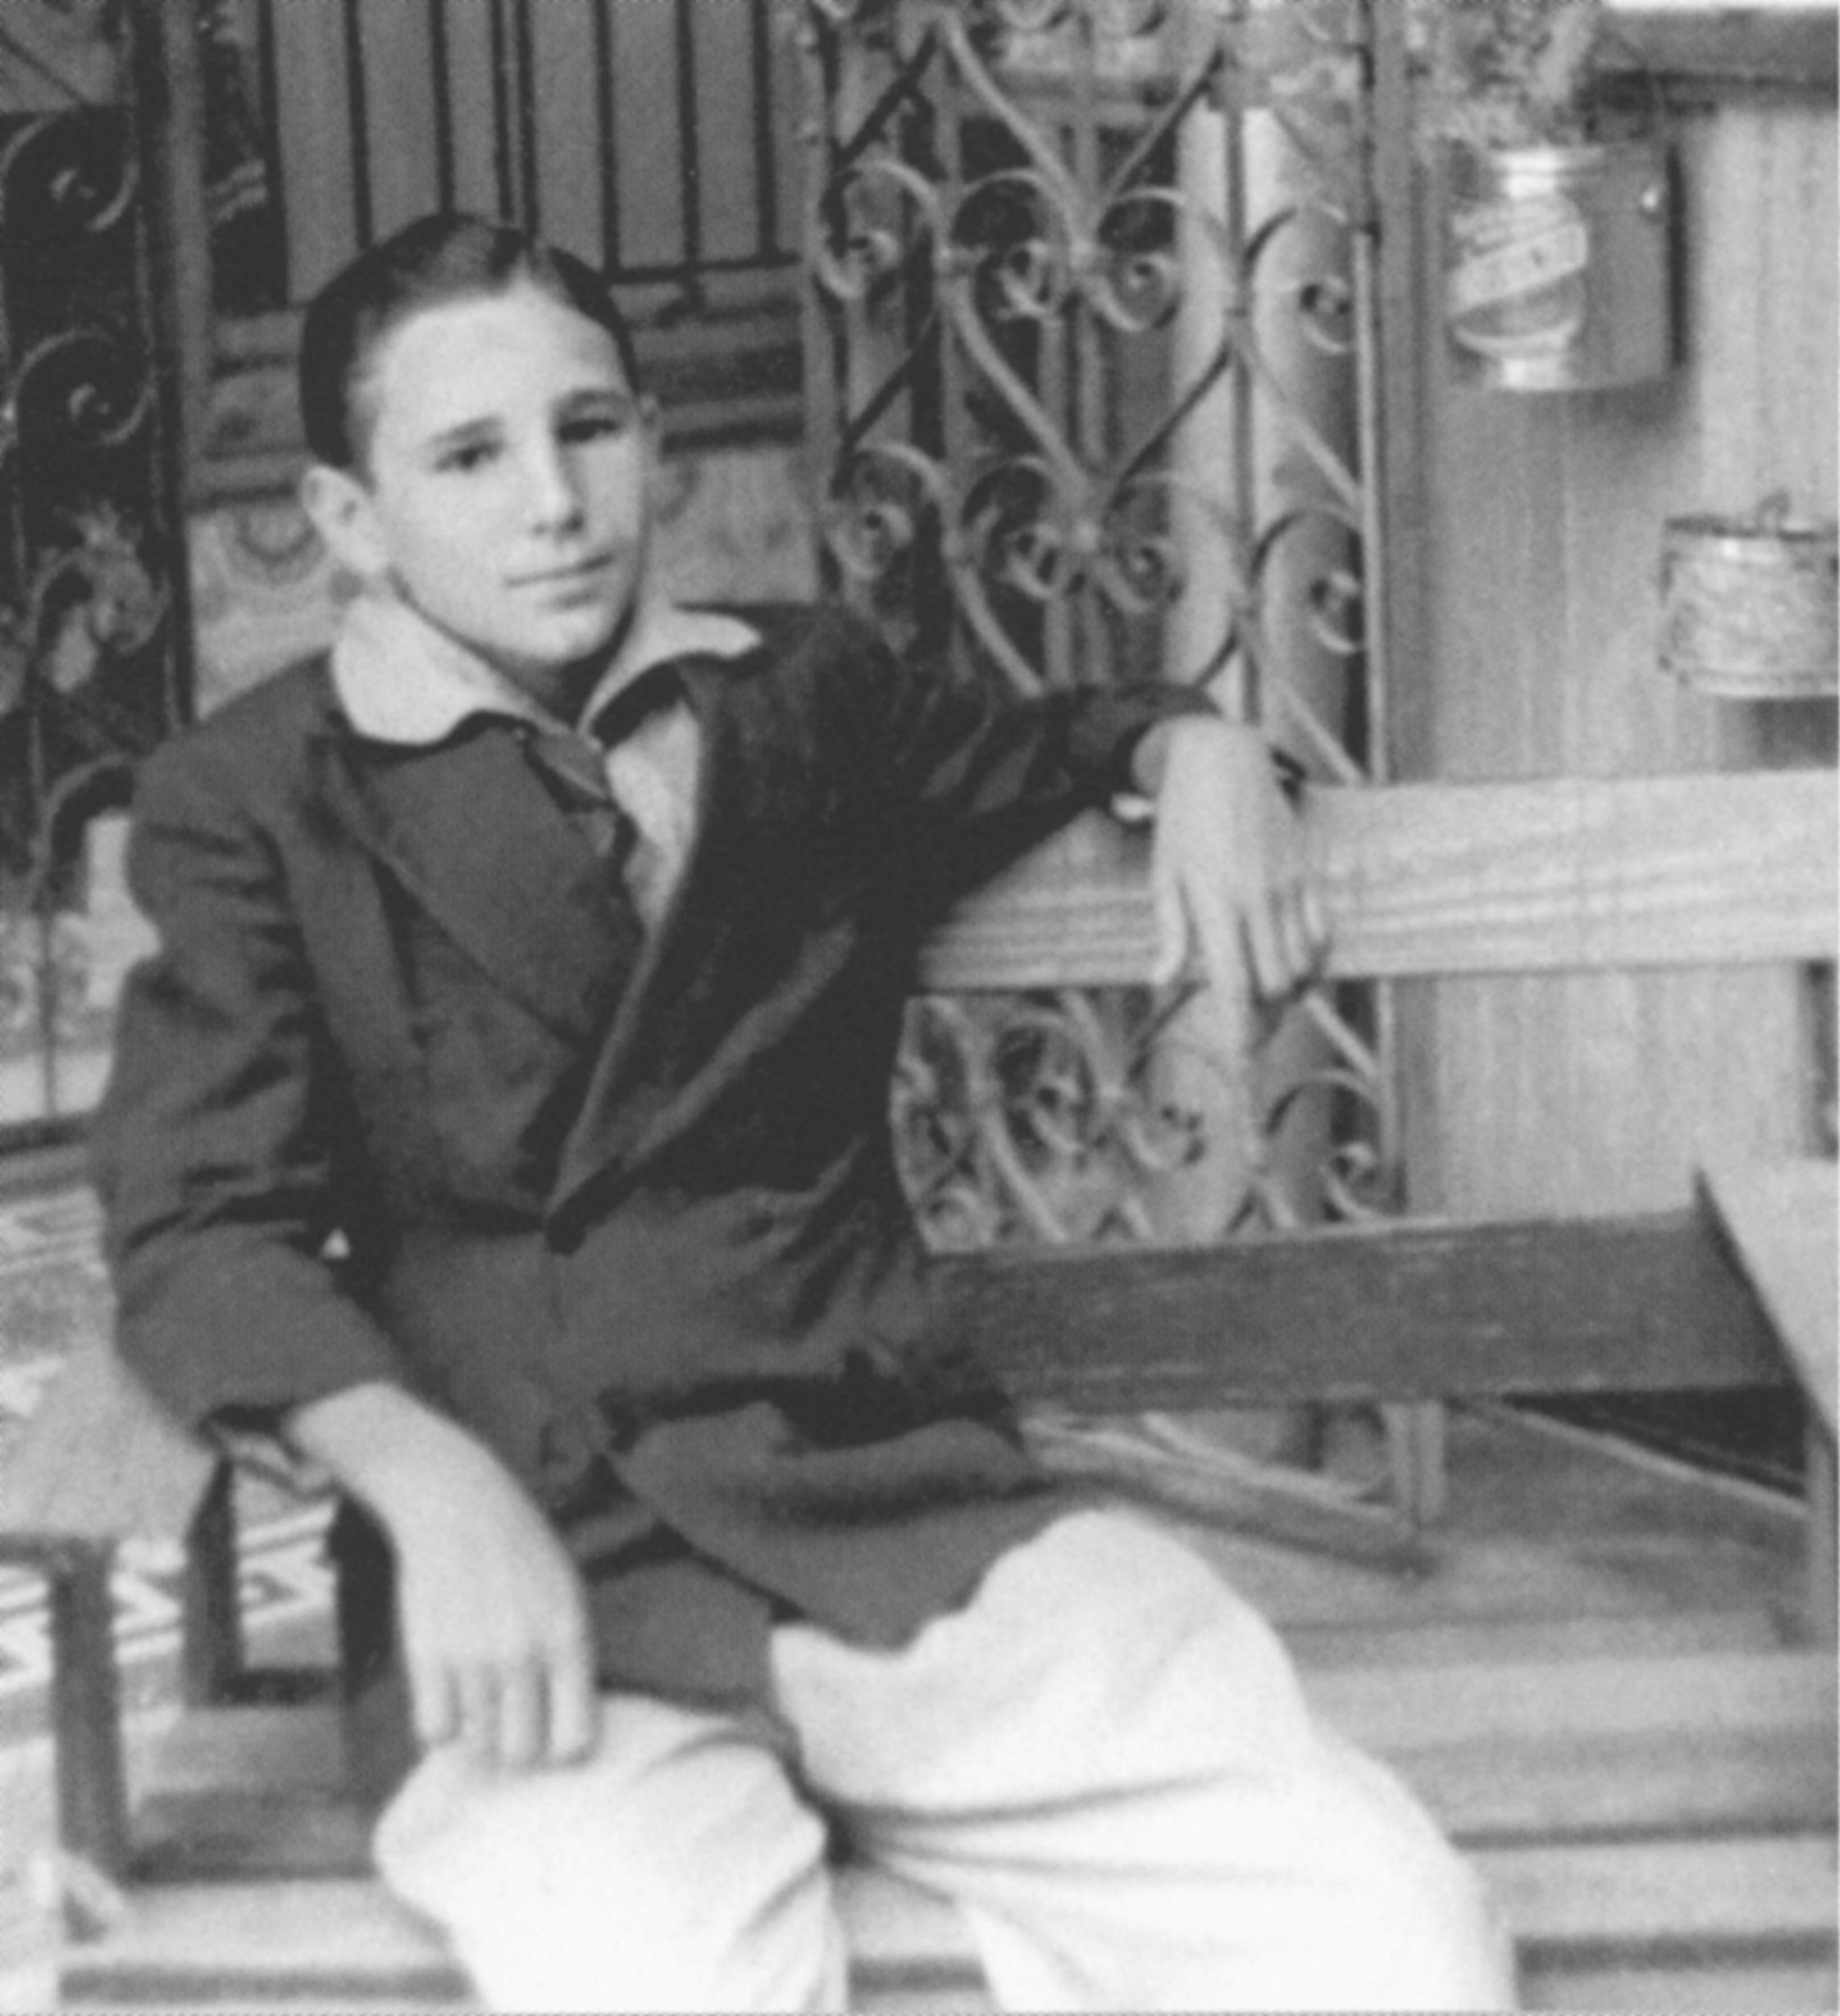 Fidel Castro at age 14 in Santiago de Cuba, in southern Cuba, 1940.